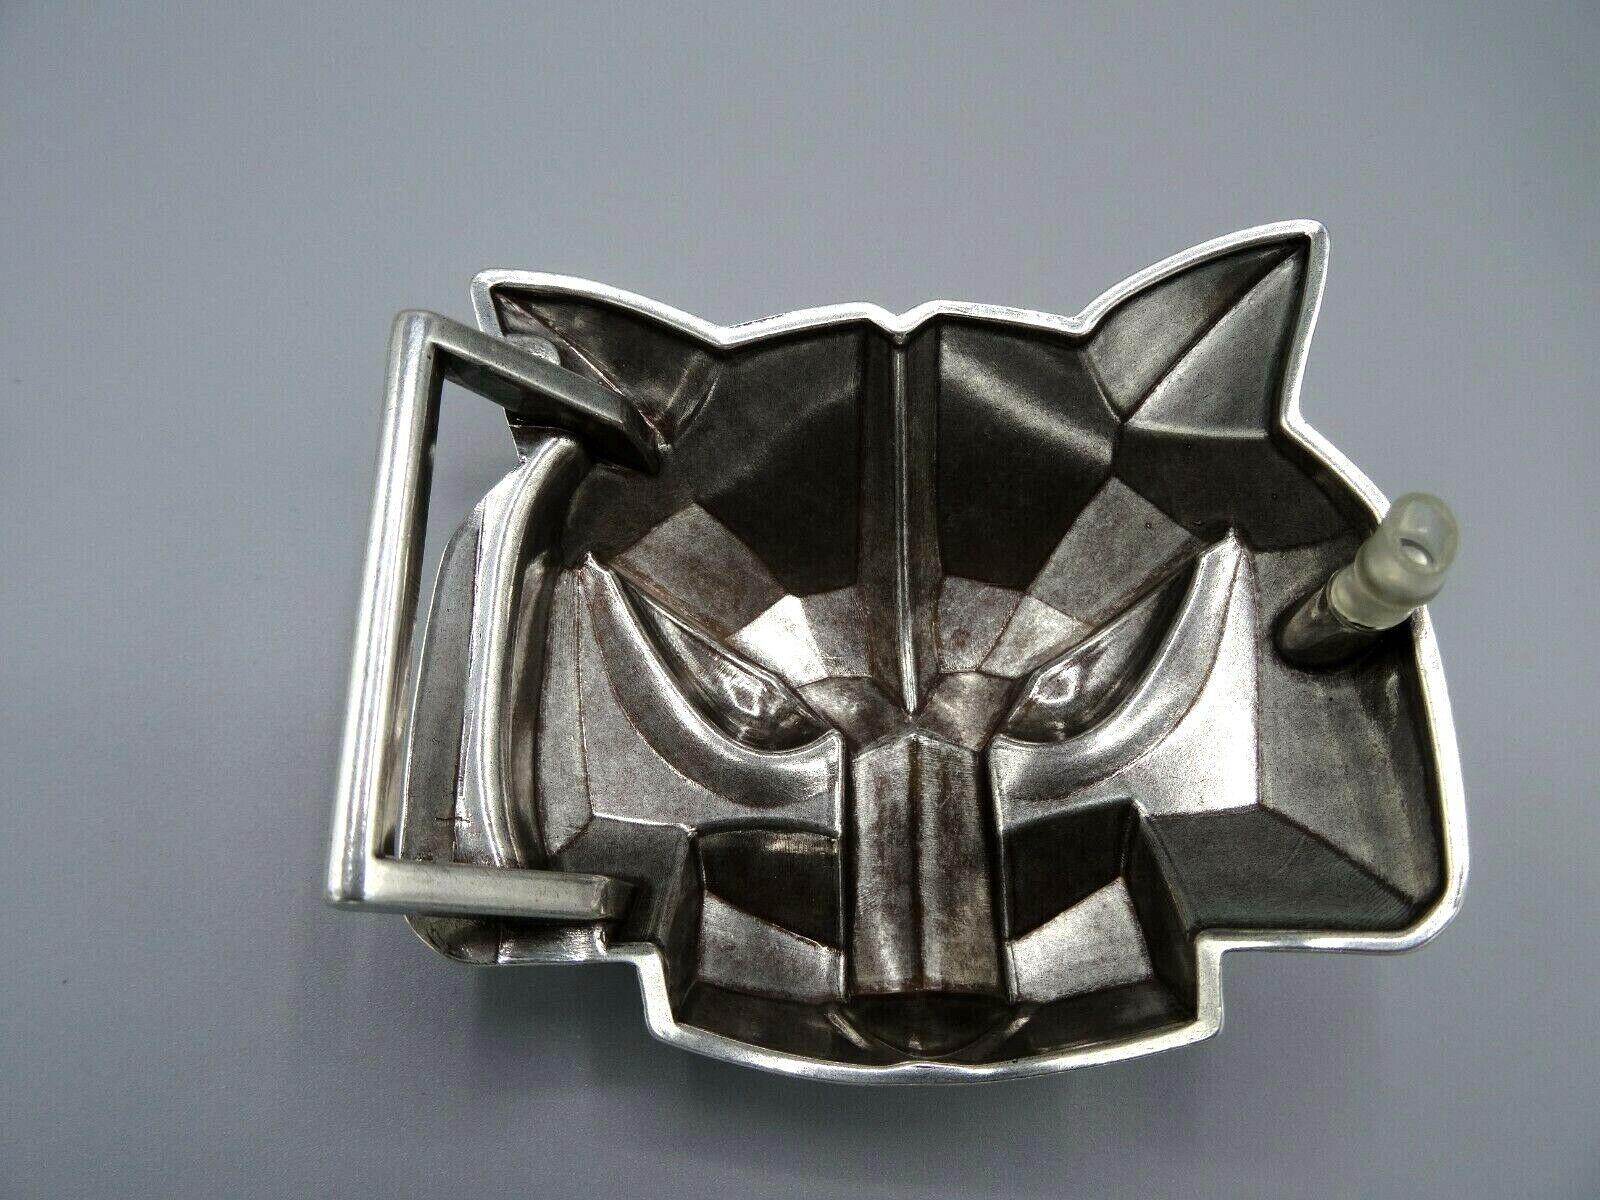 Gürtelschnalle Buckle 3D Design Wolf Raubtier Hund Gürtelschnalle 4 cm TOP /D9